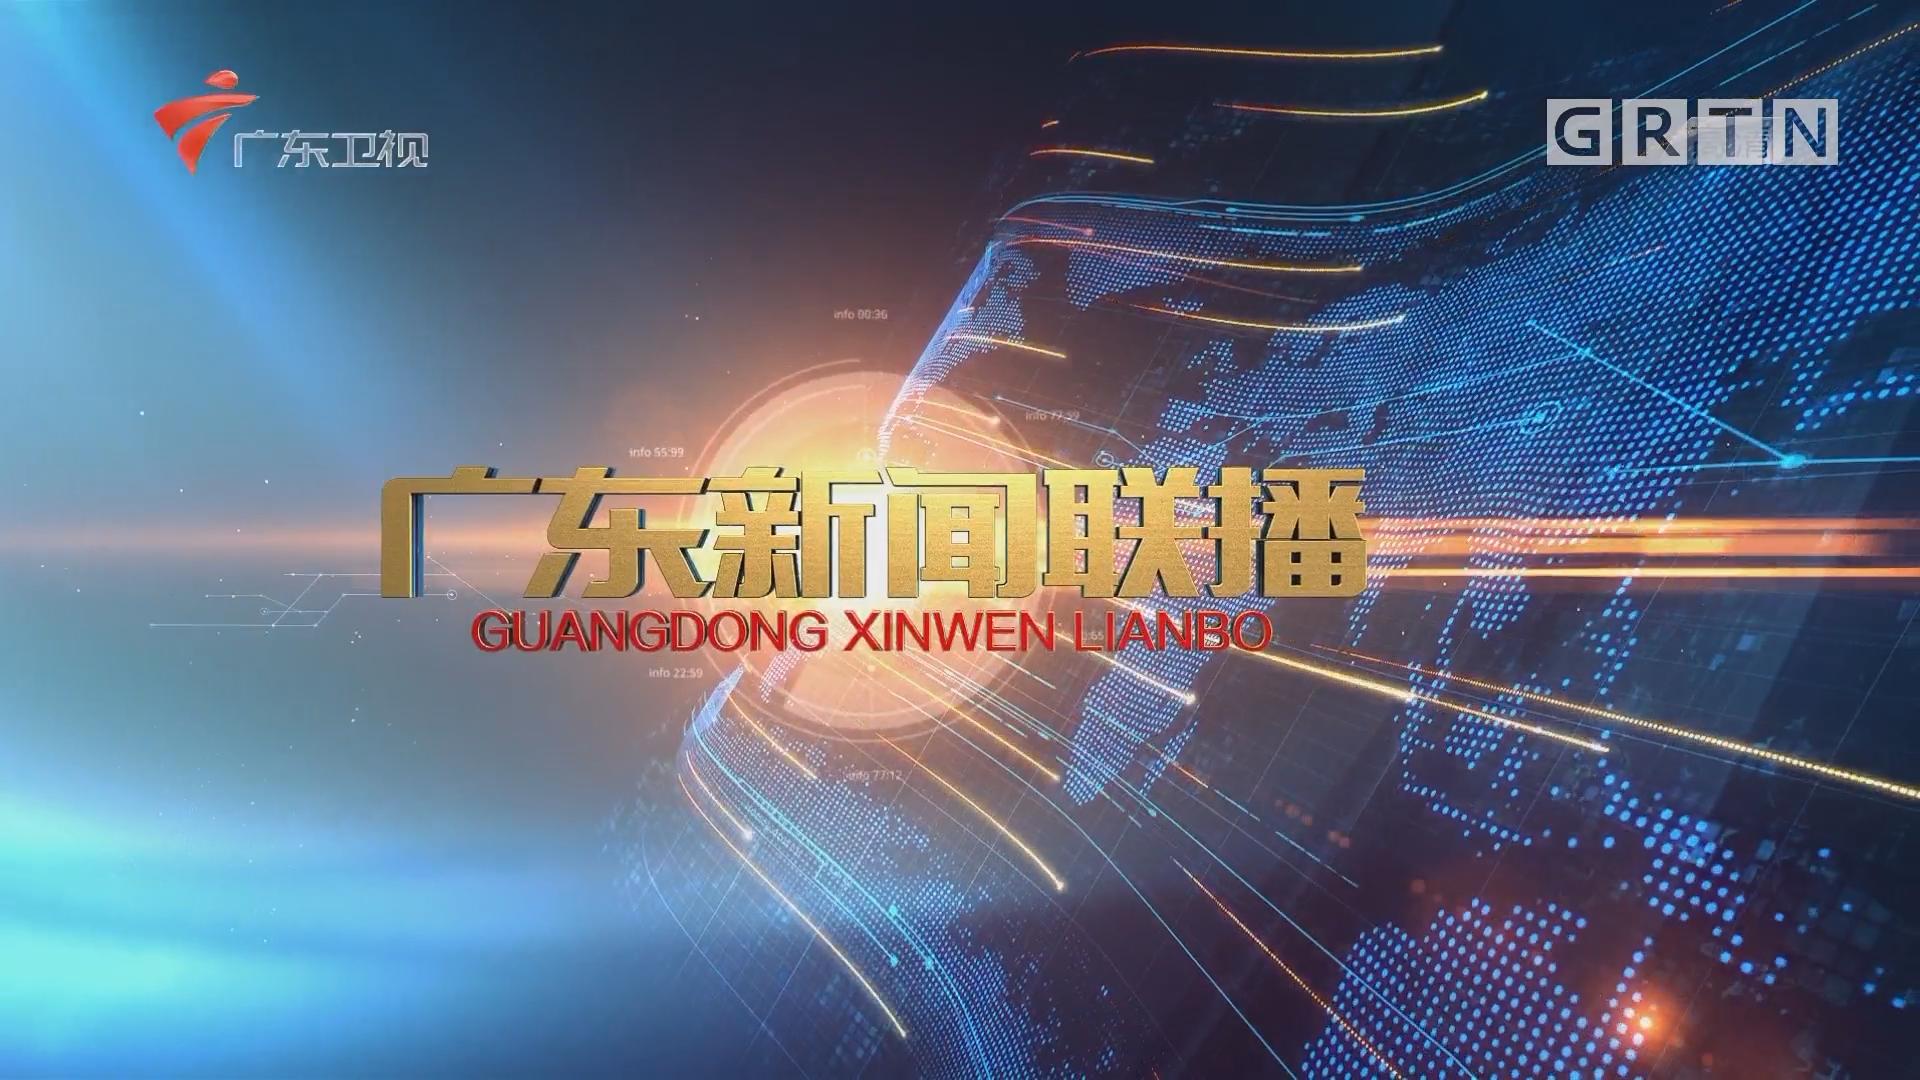 [HD][2018-10-21]广东新闻联播:广东:推动基层党组织建设全面进步全面过硬